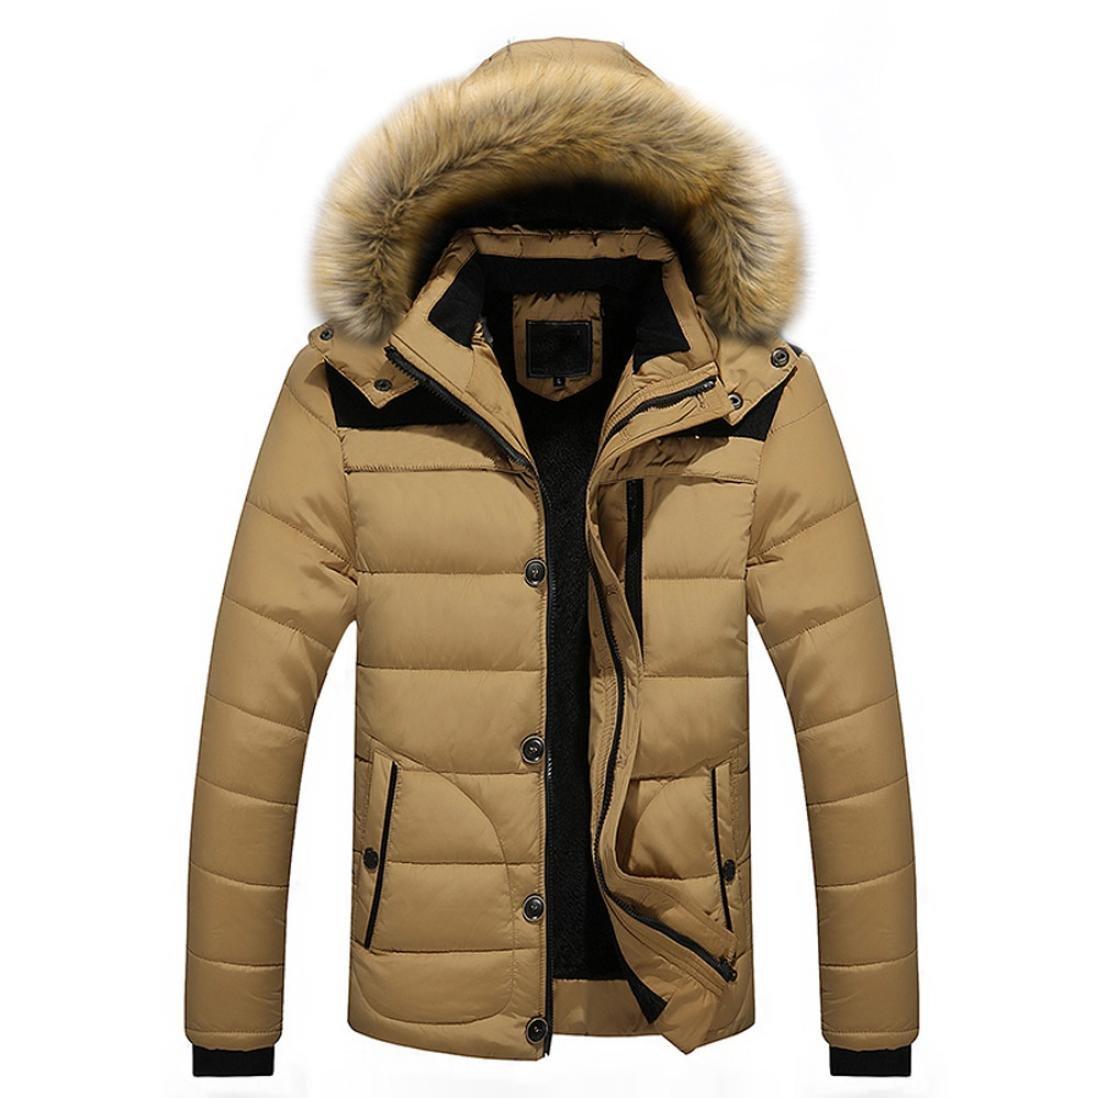 YANG-YI Mens HOT Warm Blouse Winter Thick Jacket Plus Fur Hooded Coat Jacket